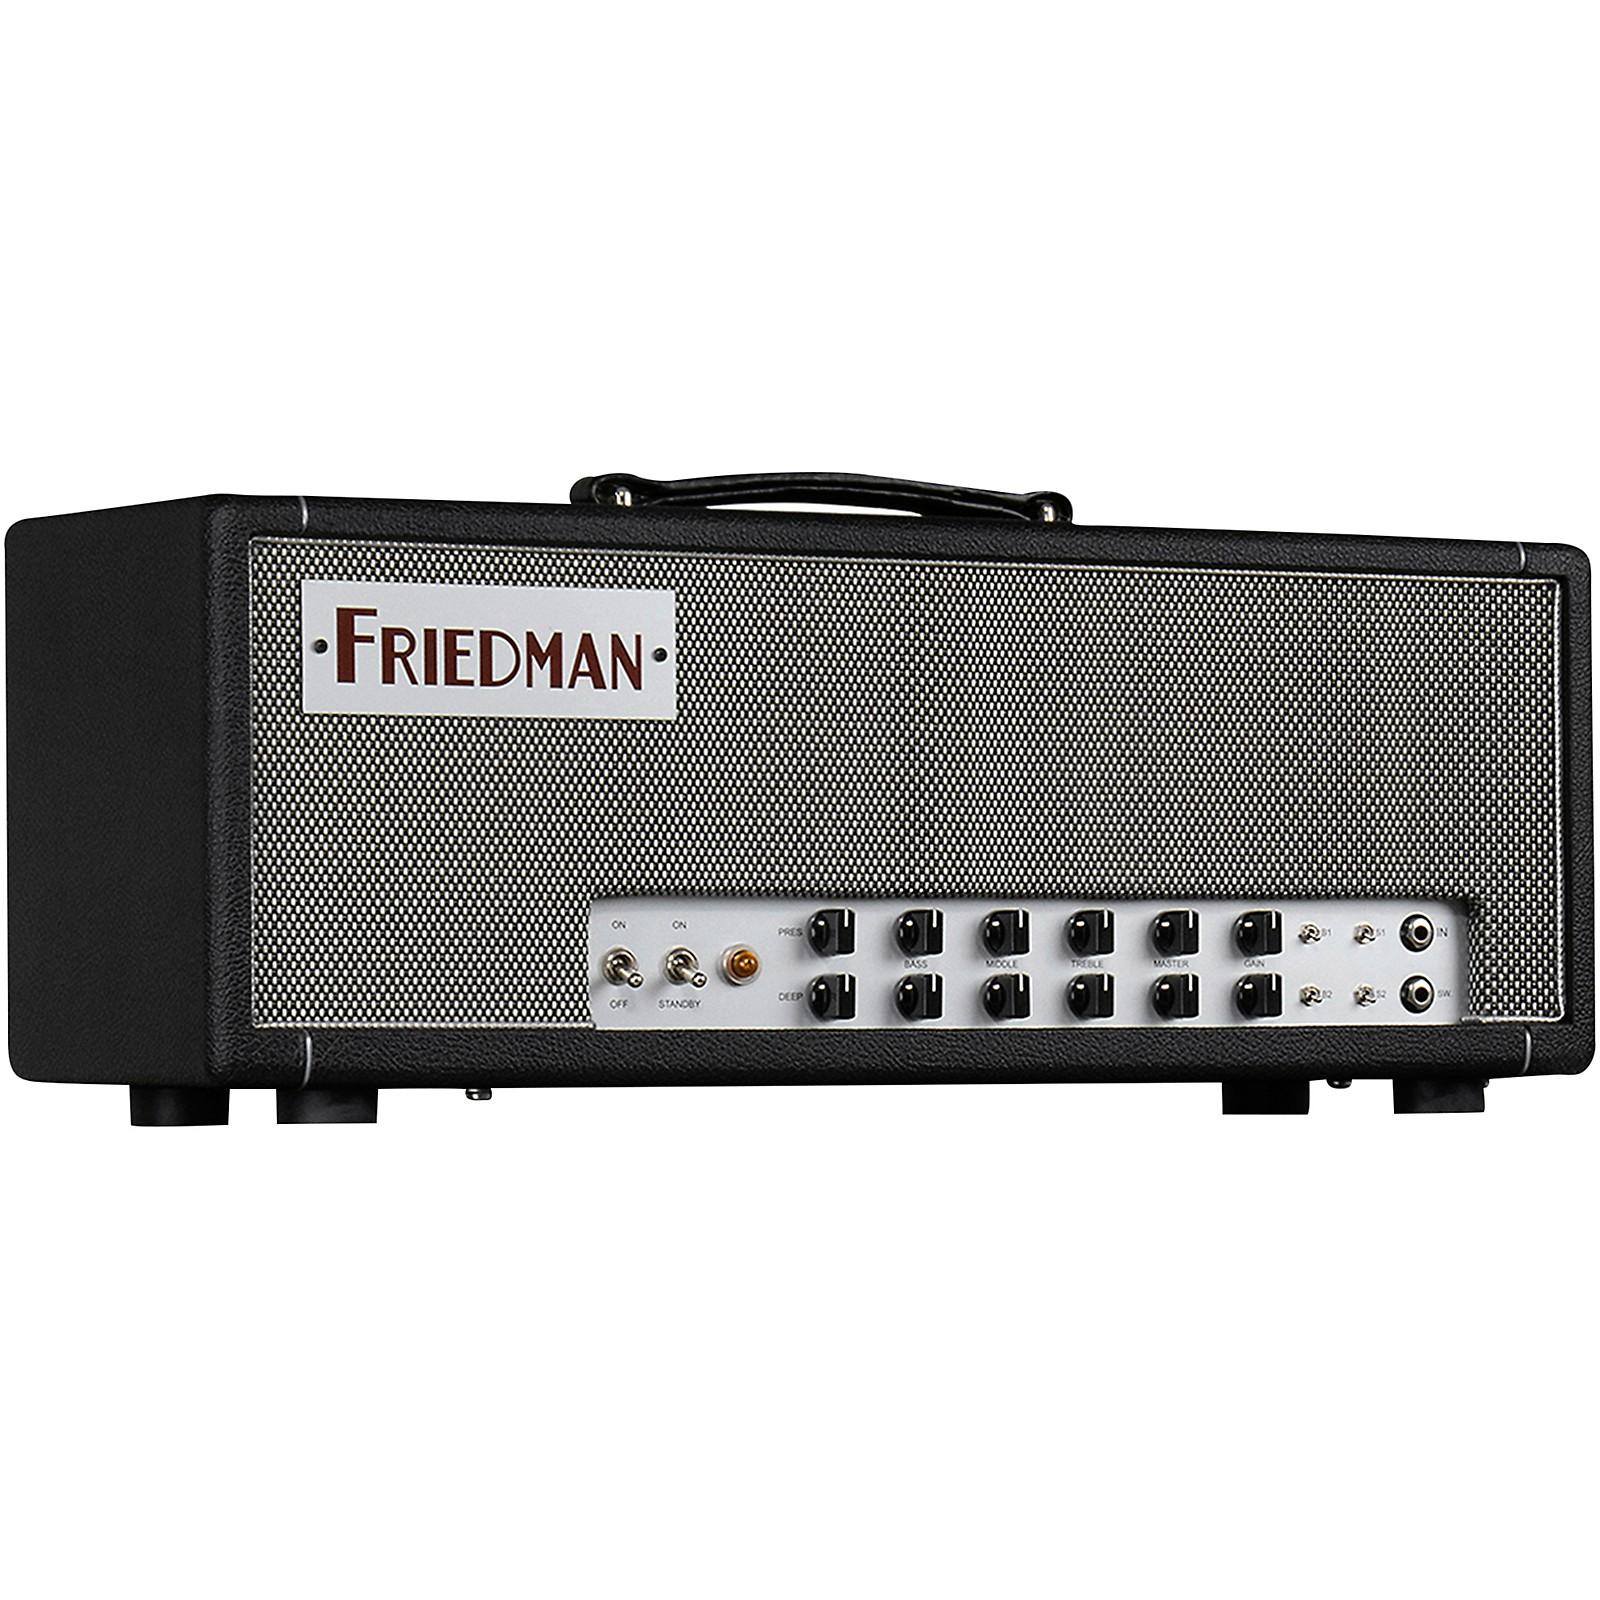 Friedman TWIN SISTER HEAD 2 Channel - 40 Watt Head - 5881 Tubes - Series FX Loop - Tube Rectified